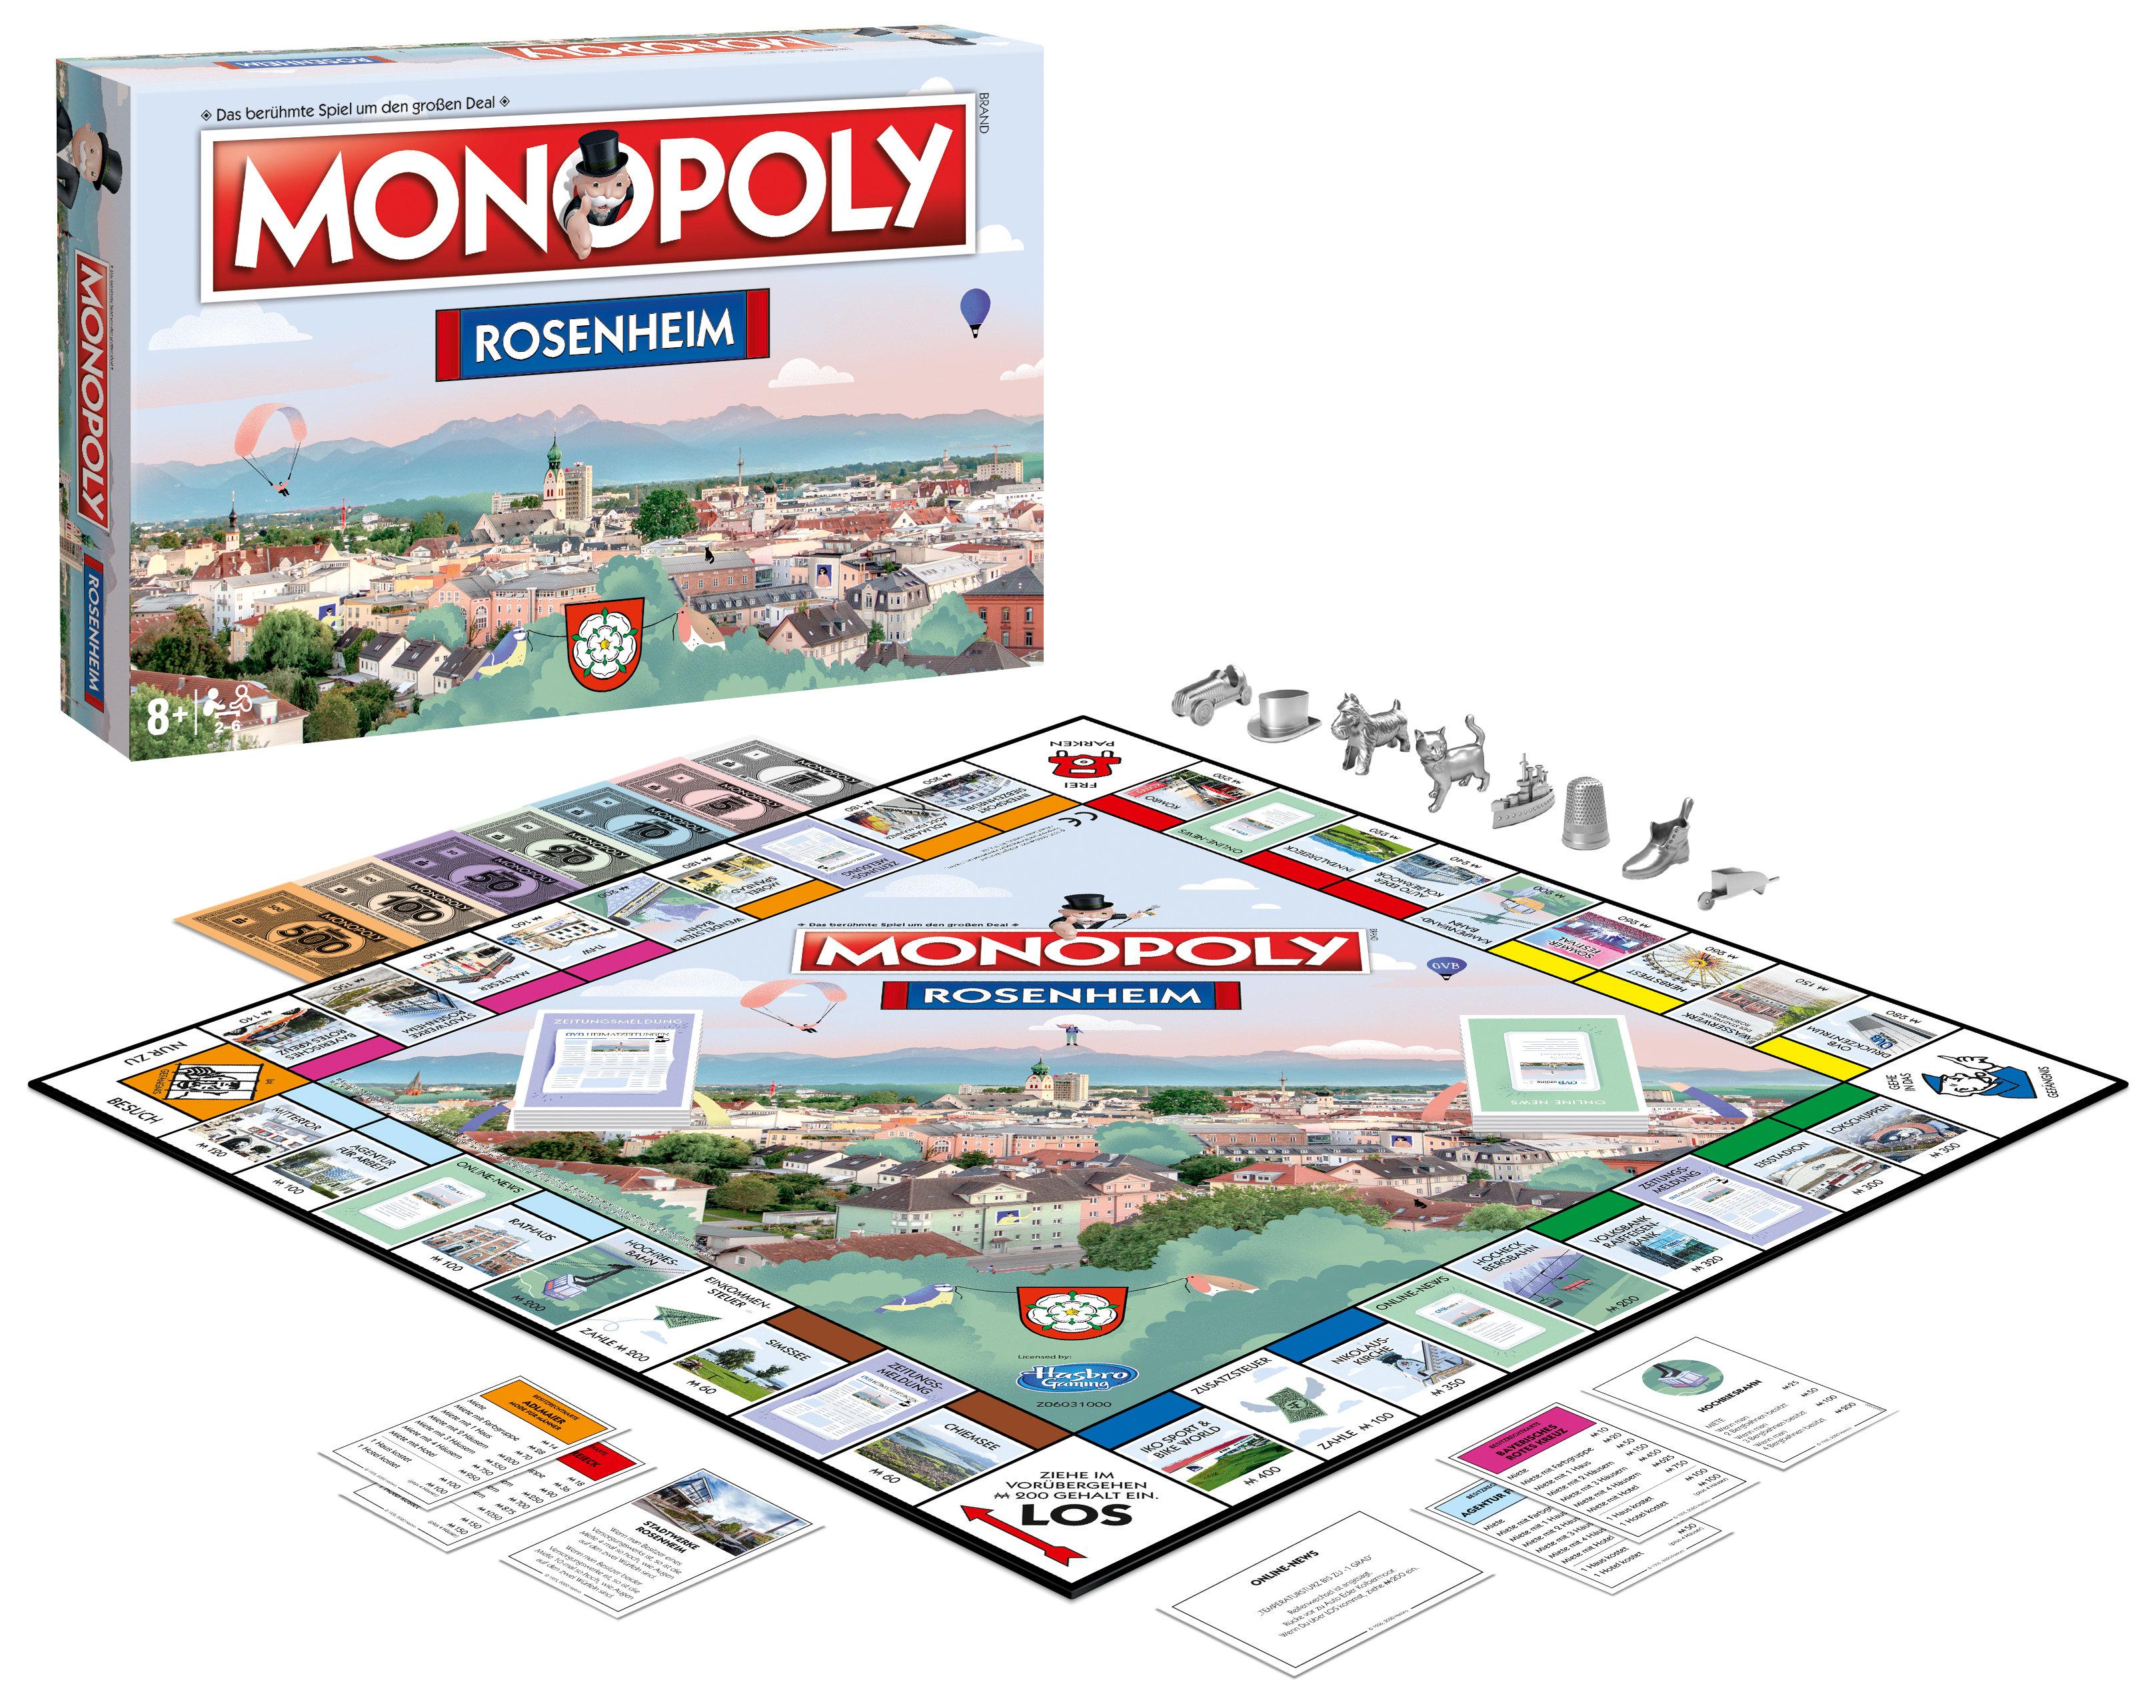 Monopoly Rosenheim